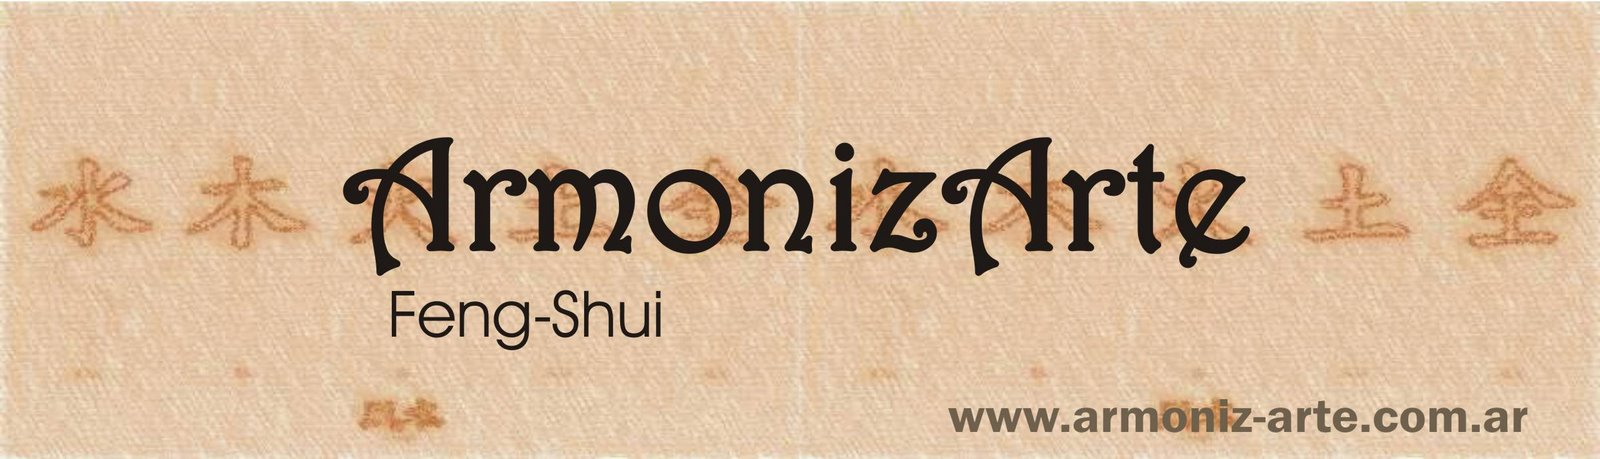 Armonizarte for Espejos rectangulares horizontales